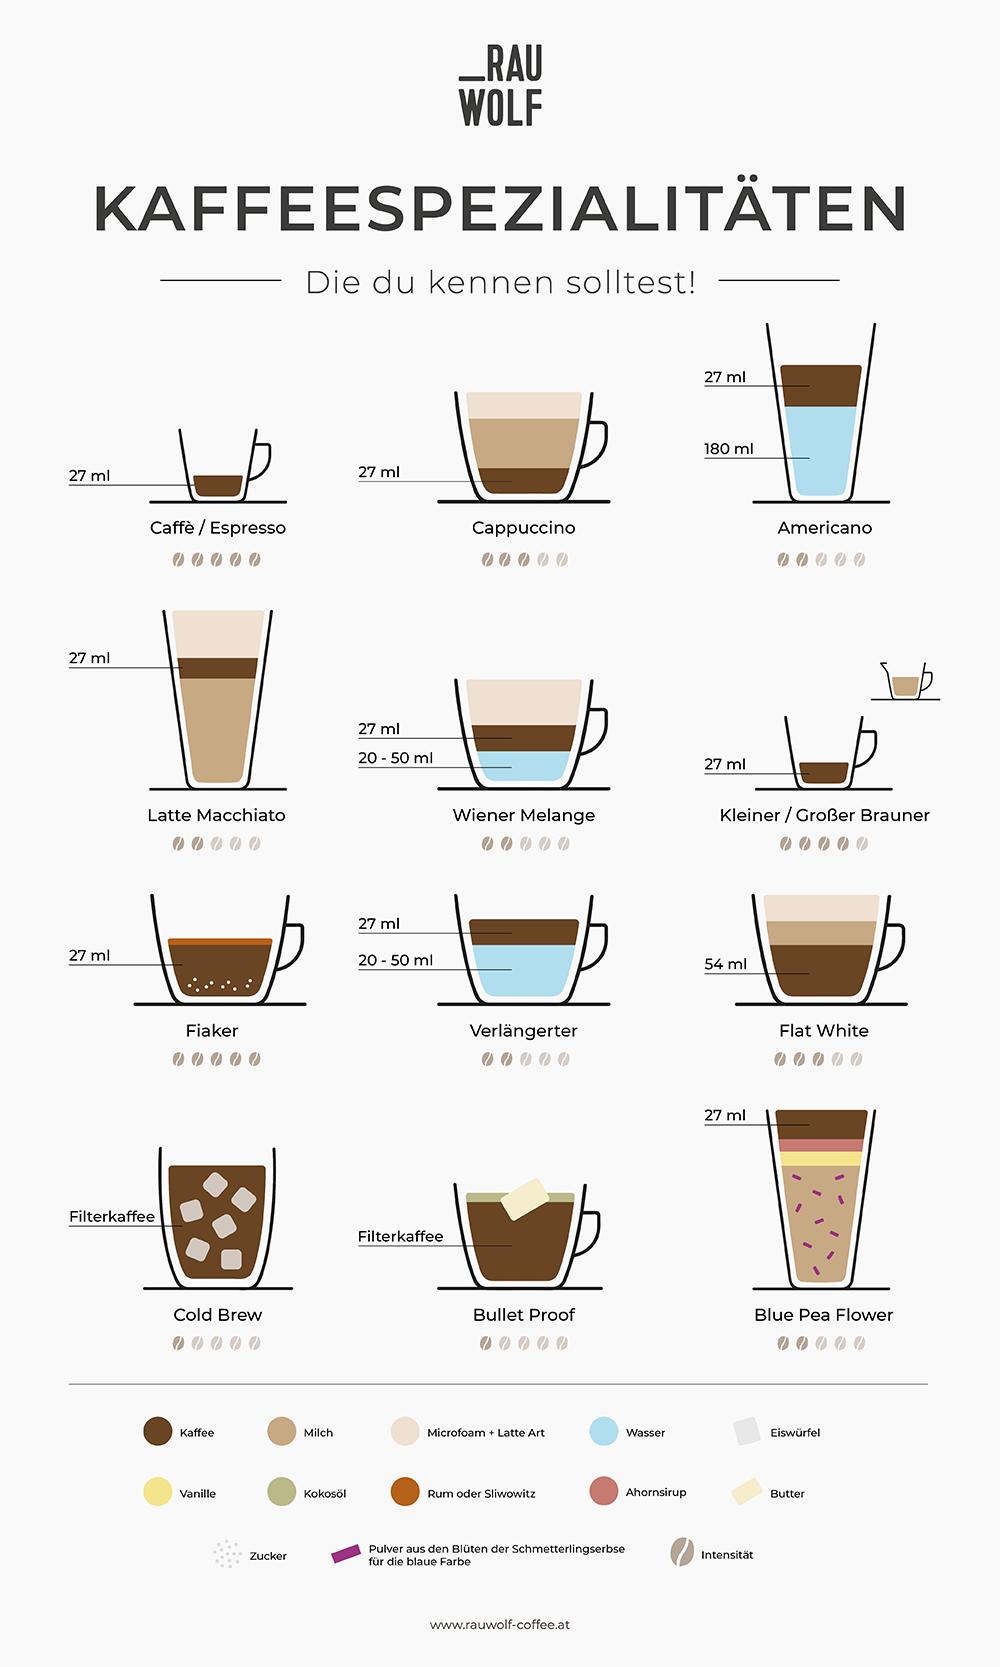 Kaffeespezialitäten, die Kaffeetrinker kennen sollten